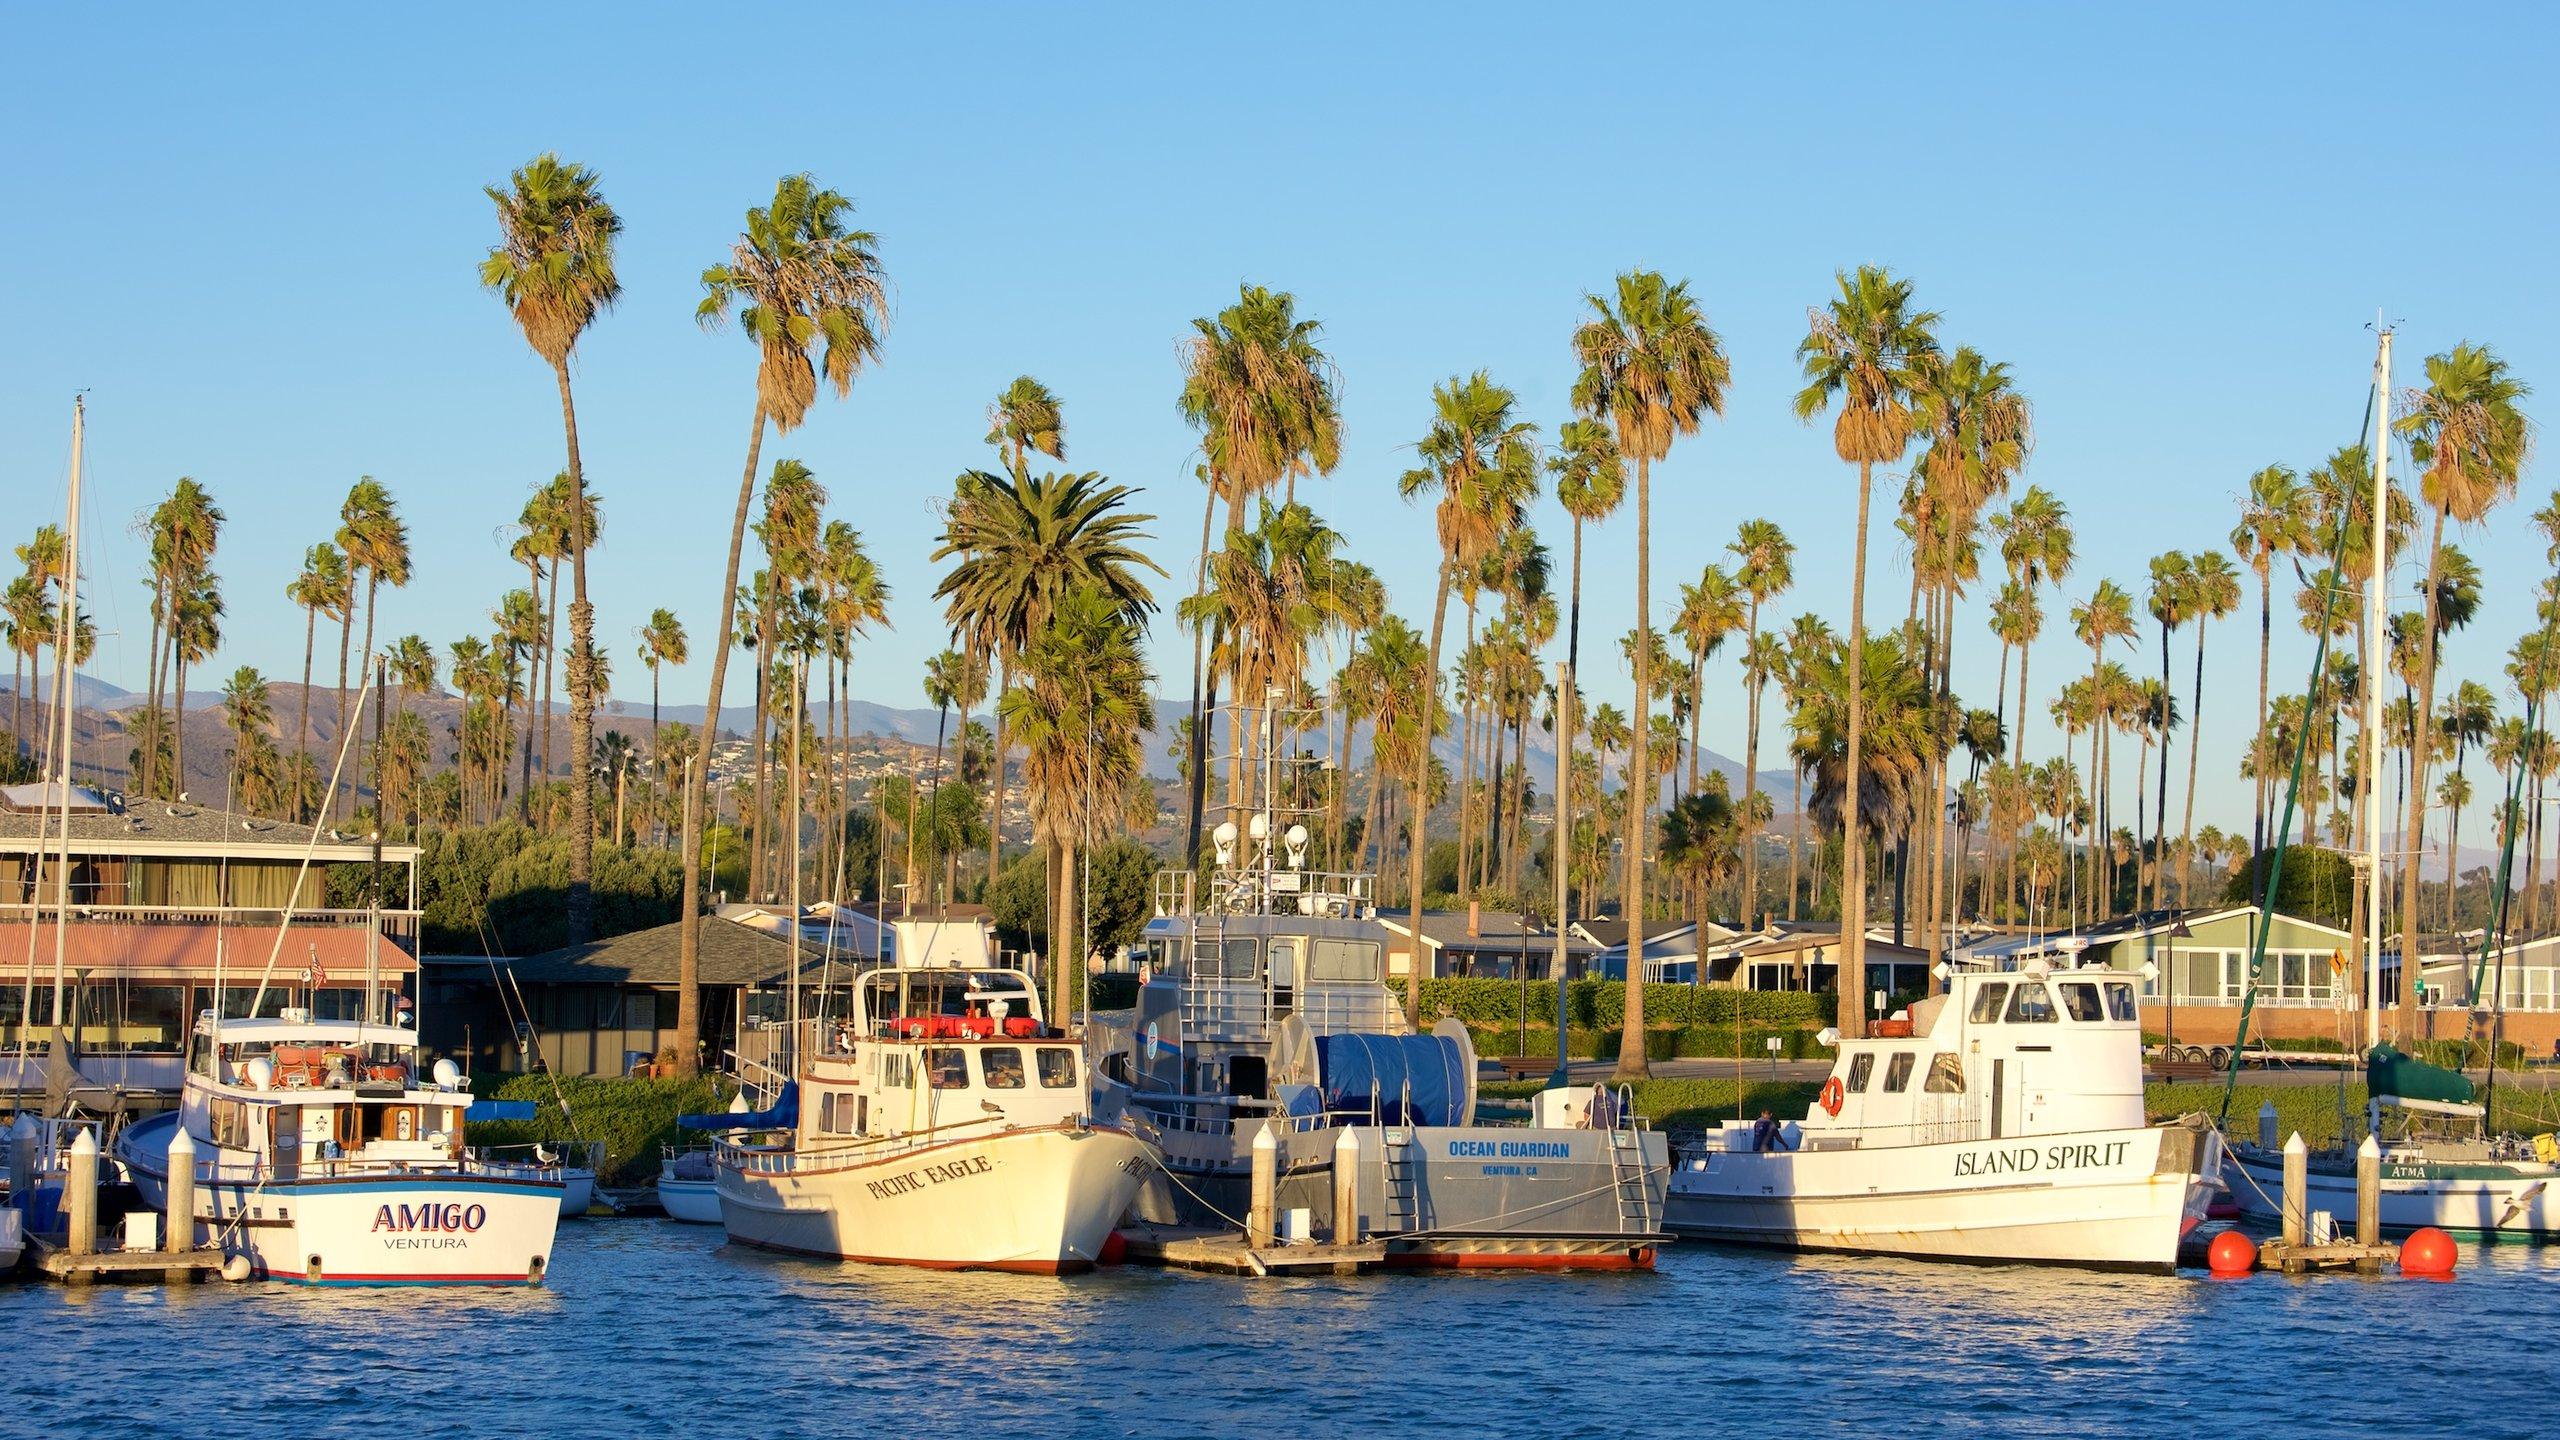 Oxnard, California, United States of America